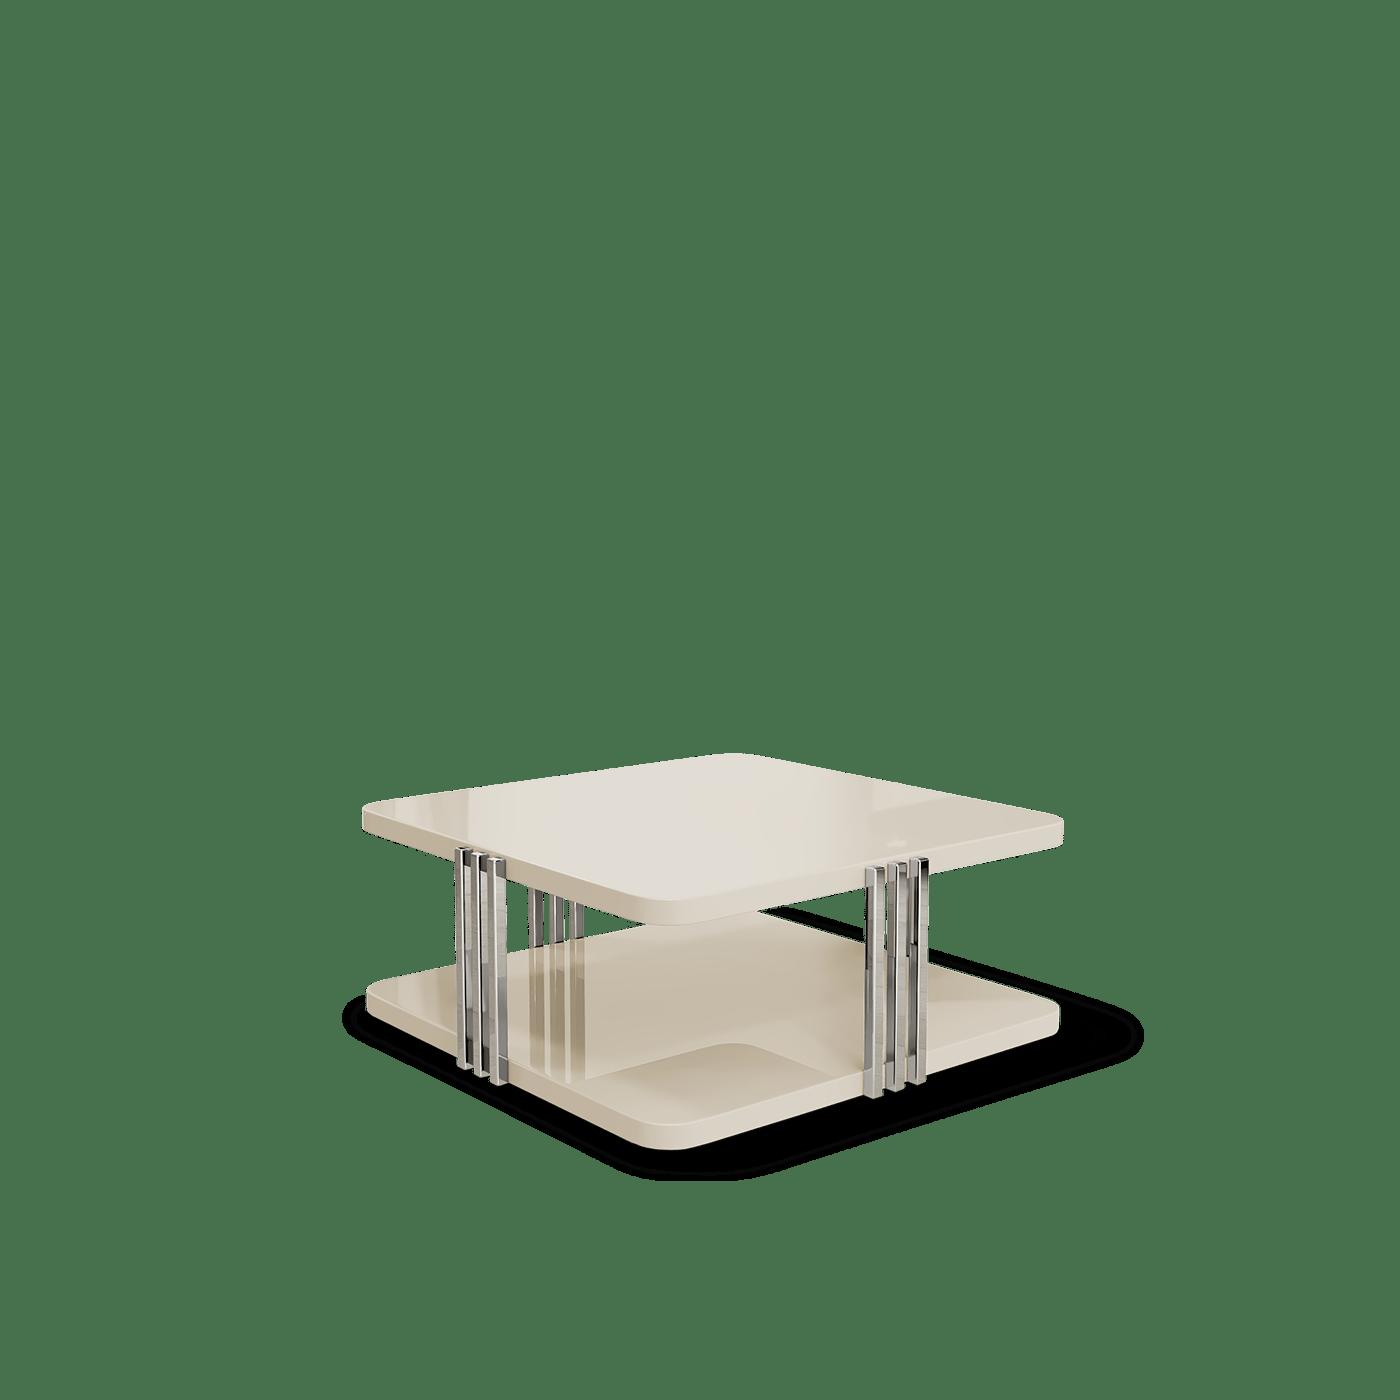 Holf II coffee table